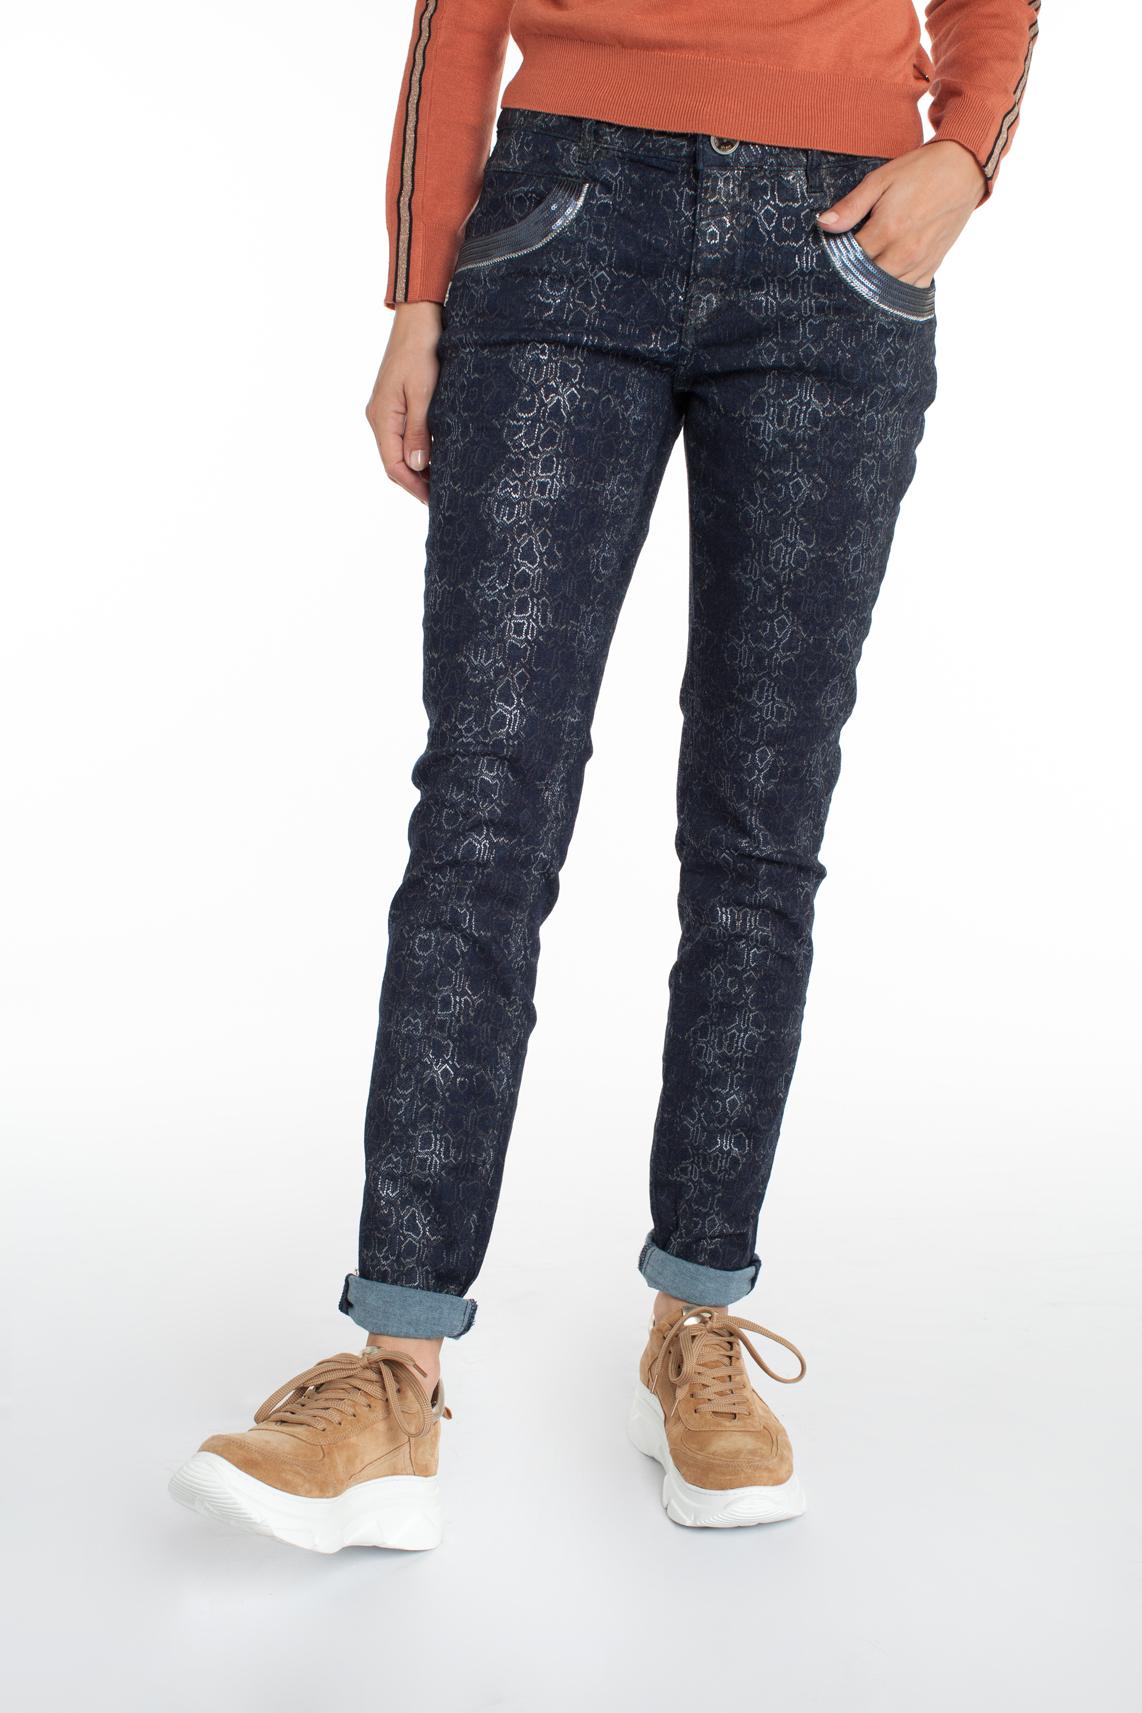 Mos Mosh Dames Naomi jeans met print Blauw